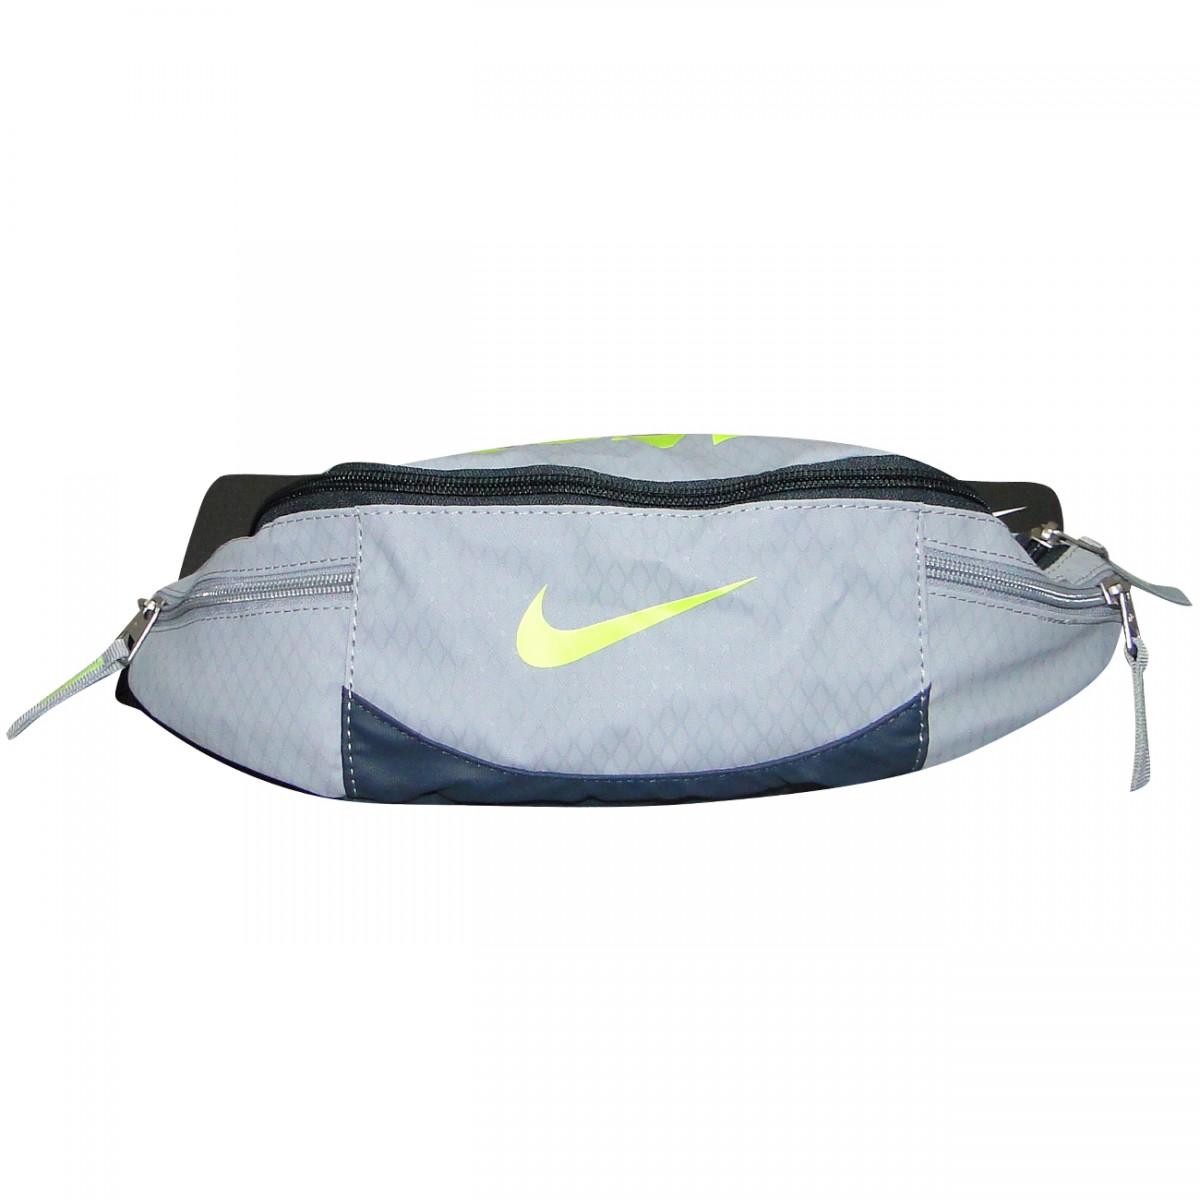 b348b3263 Pochete Nike ref.4601 BA4601 078 - Cinza/Limão - Chuteira Nike ...